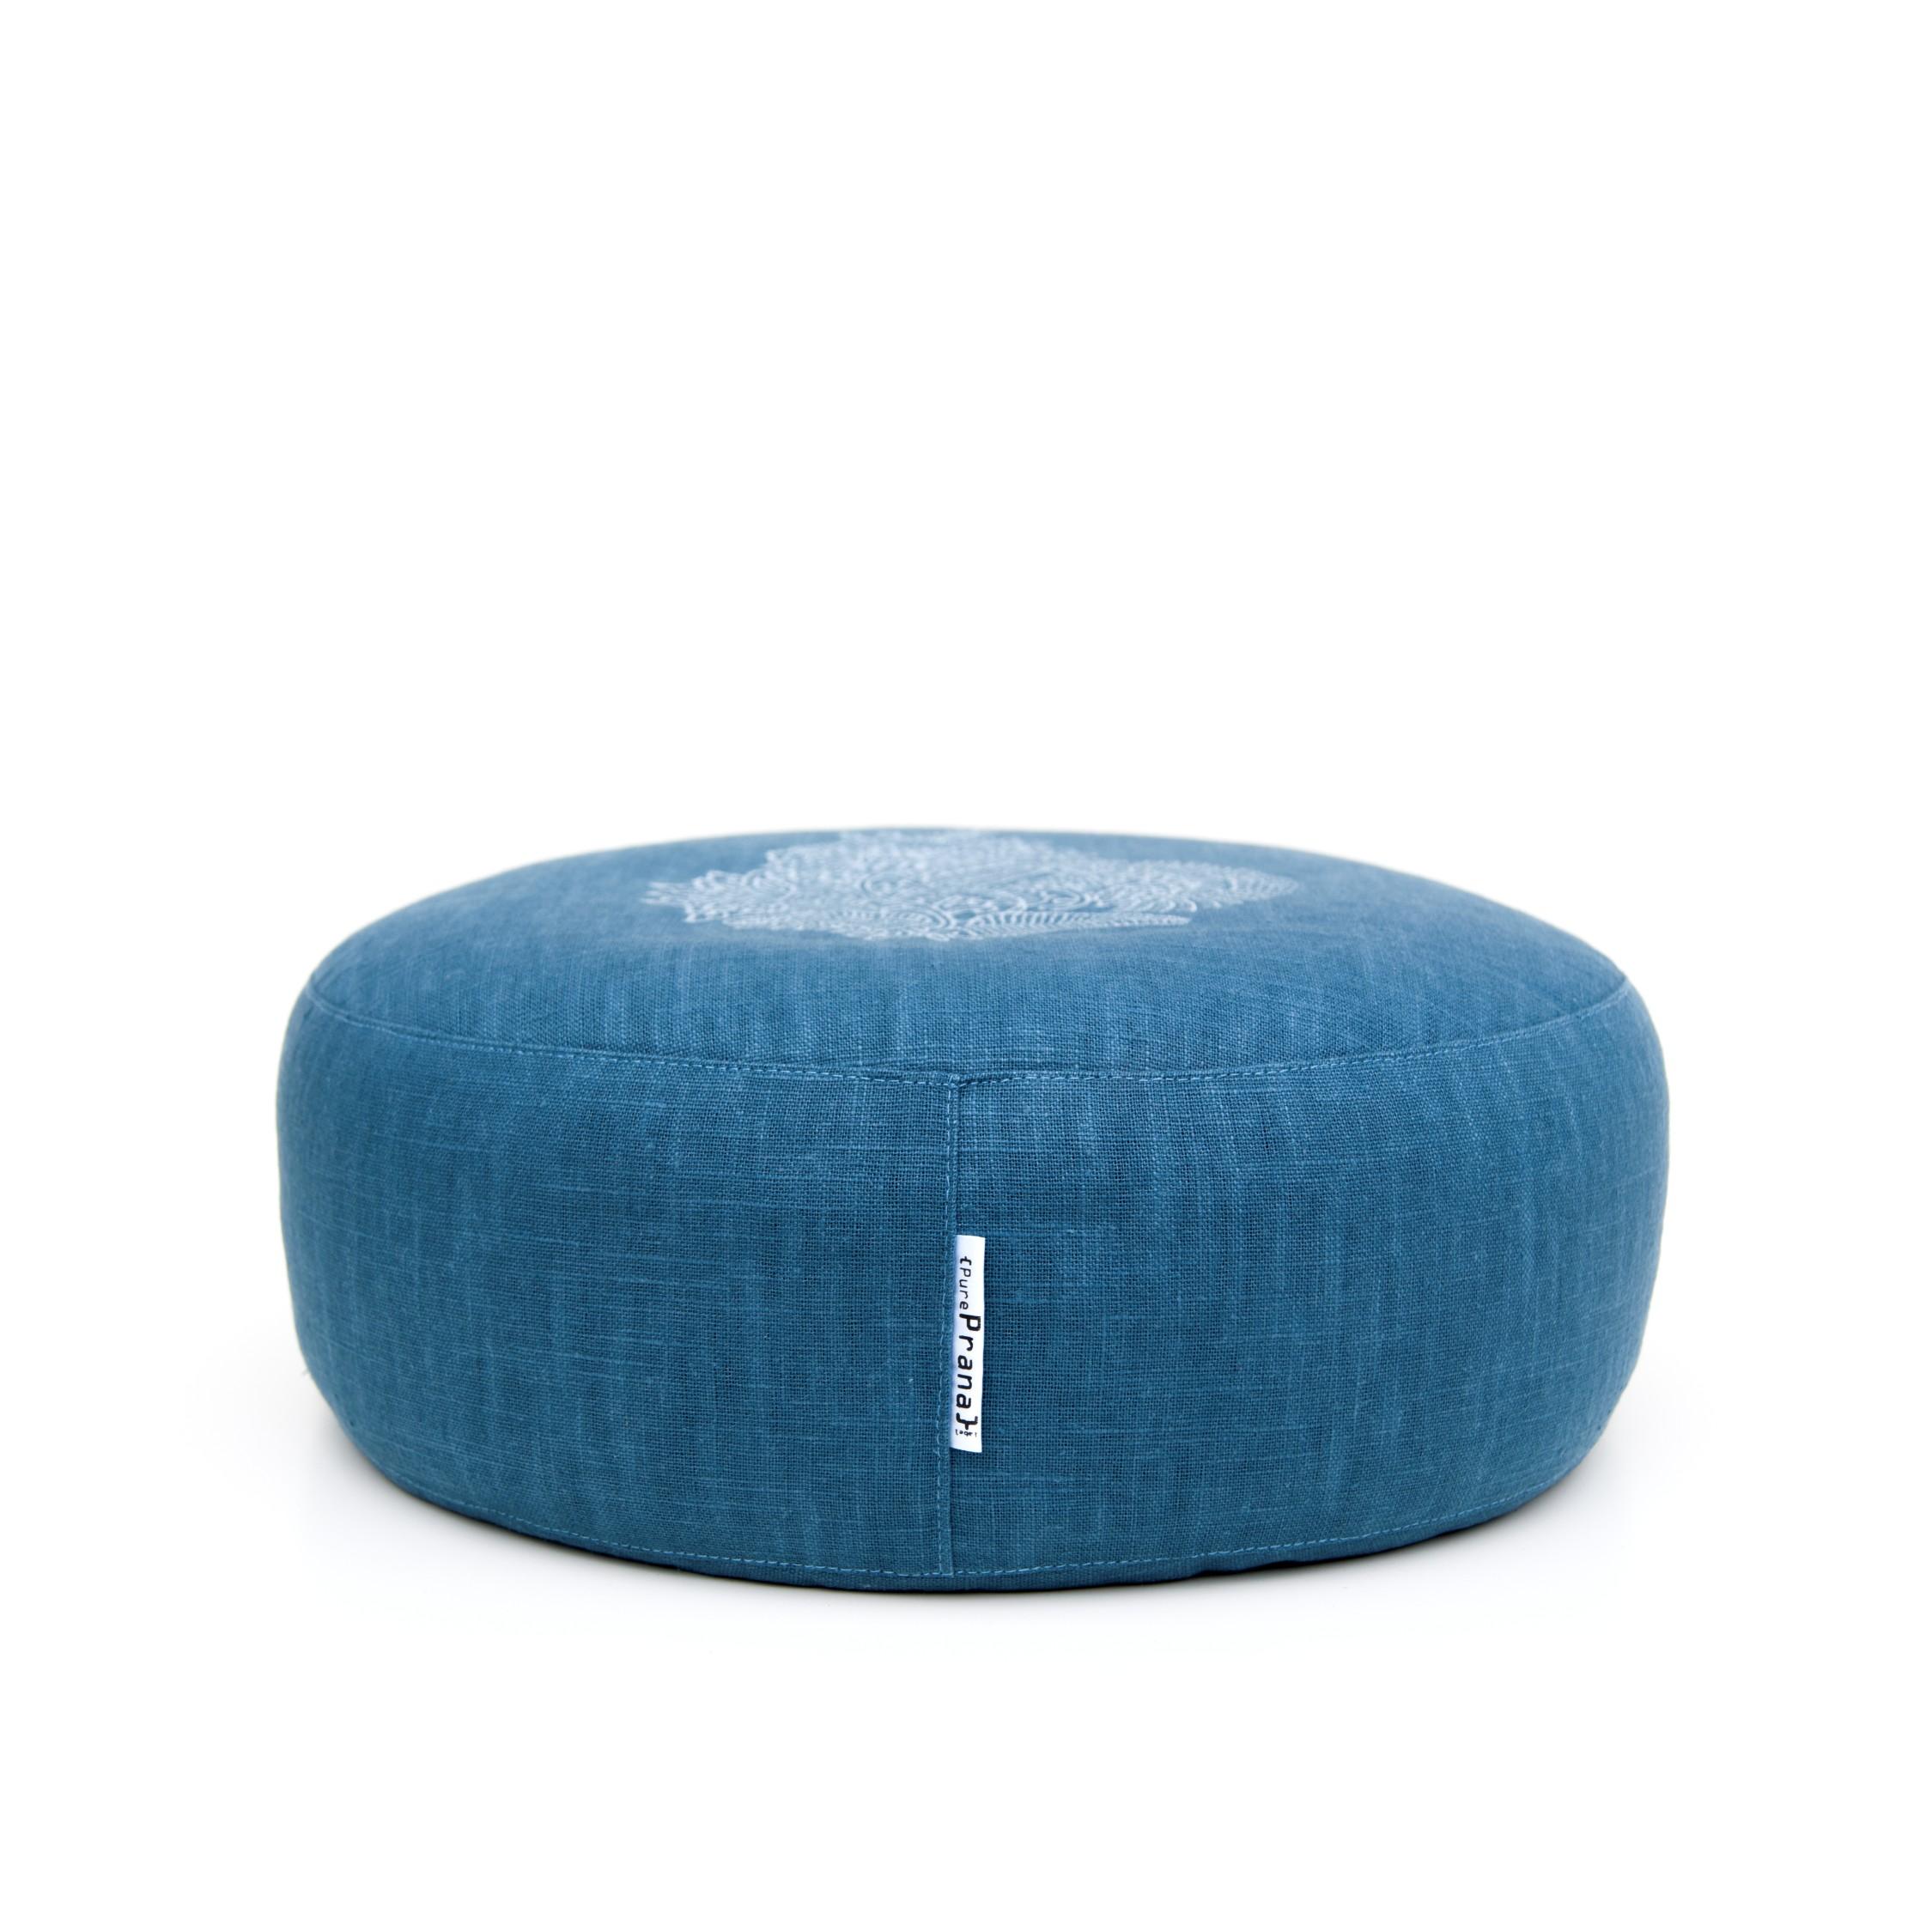 Meditation cushion Royal Blue Flower by Pure Prana Label